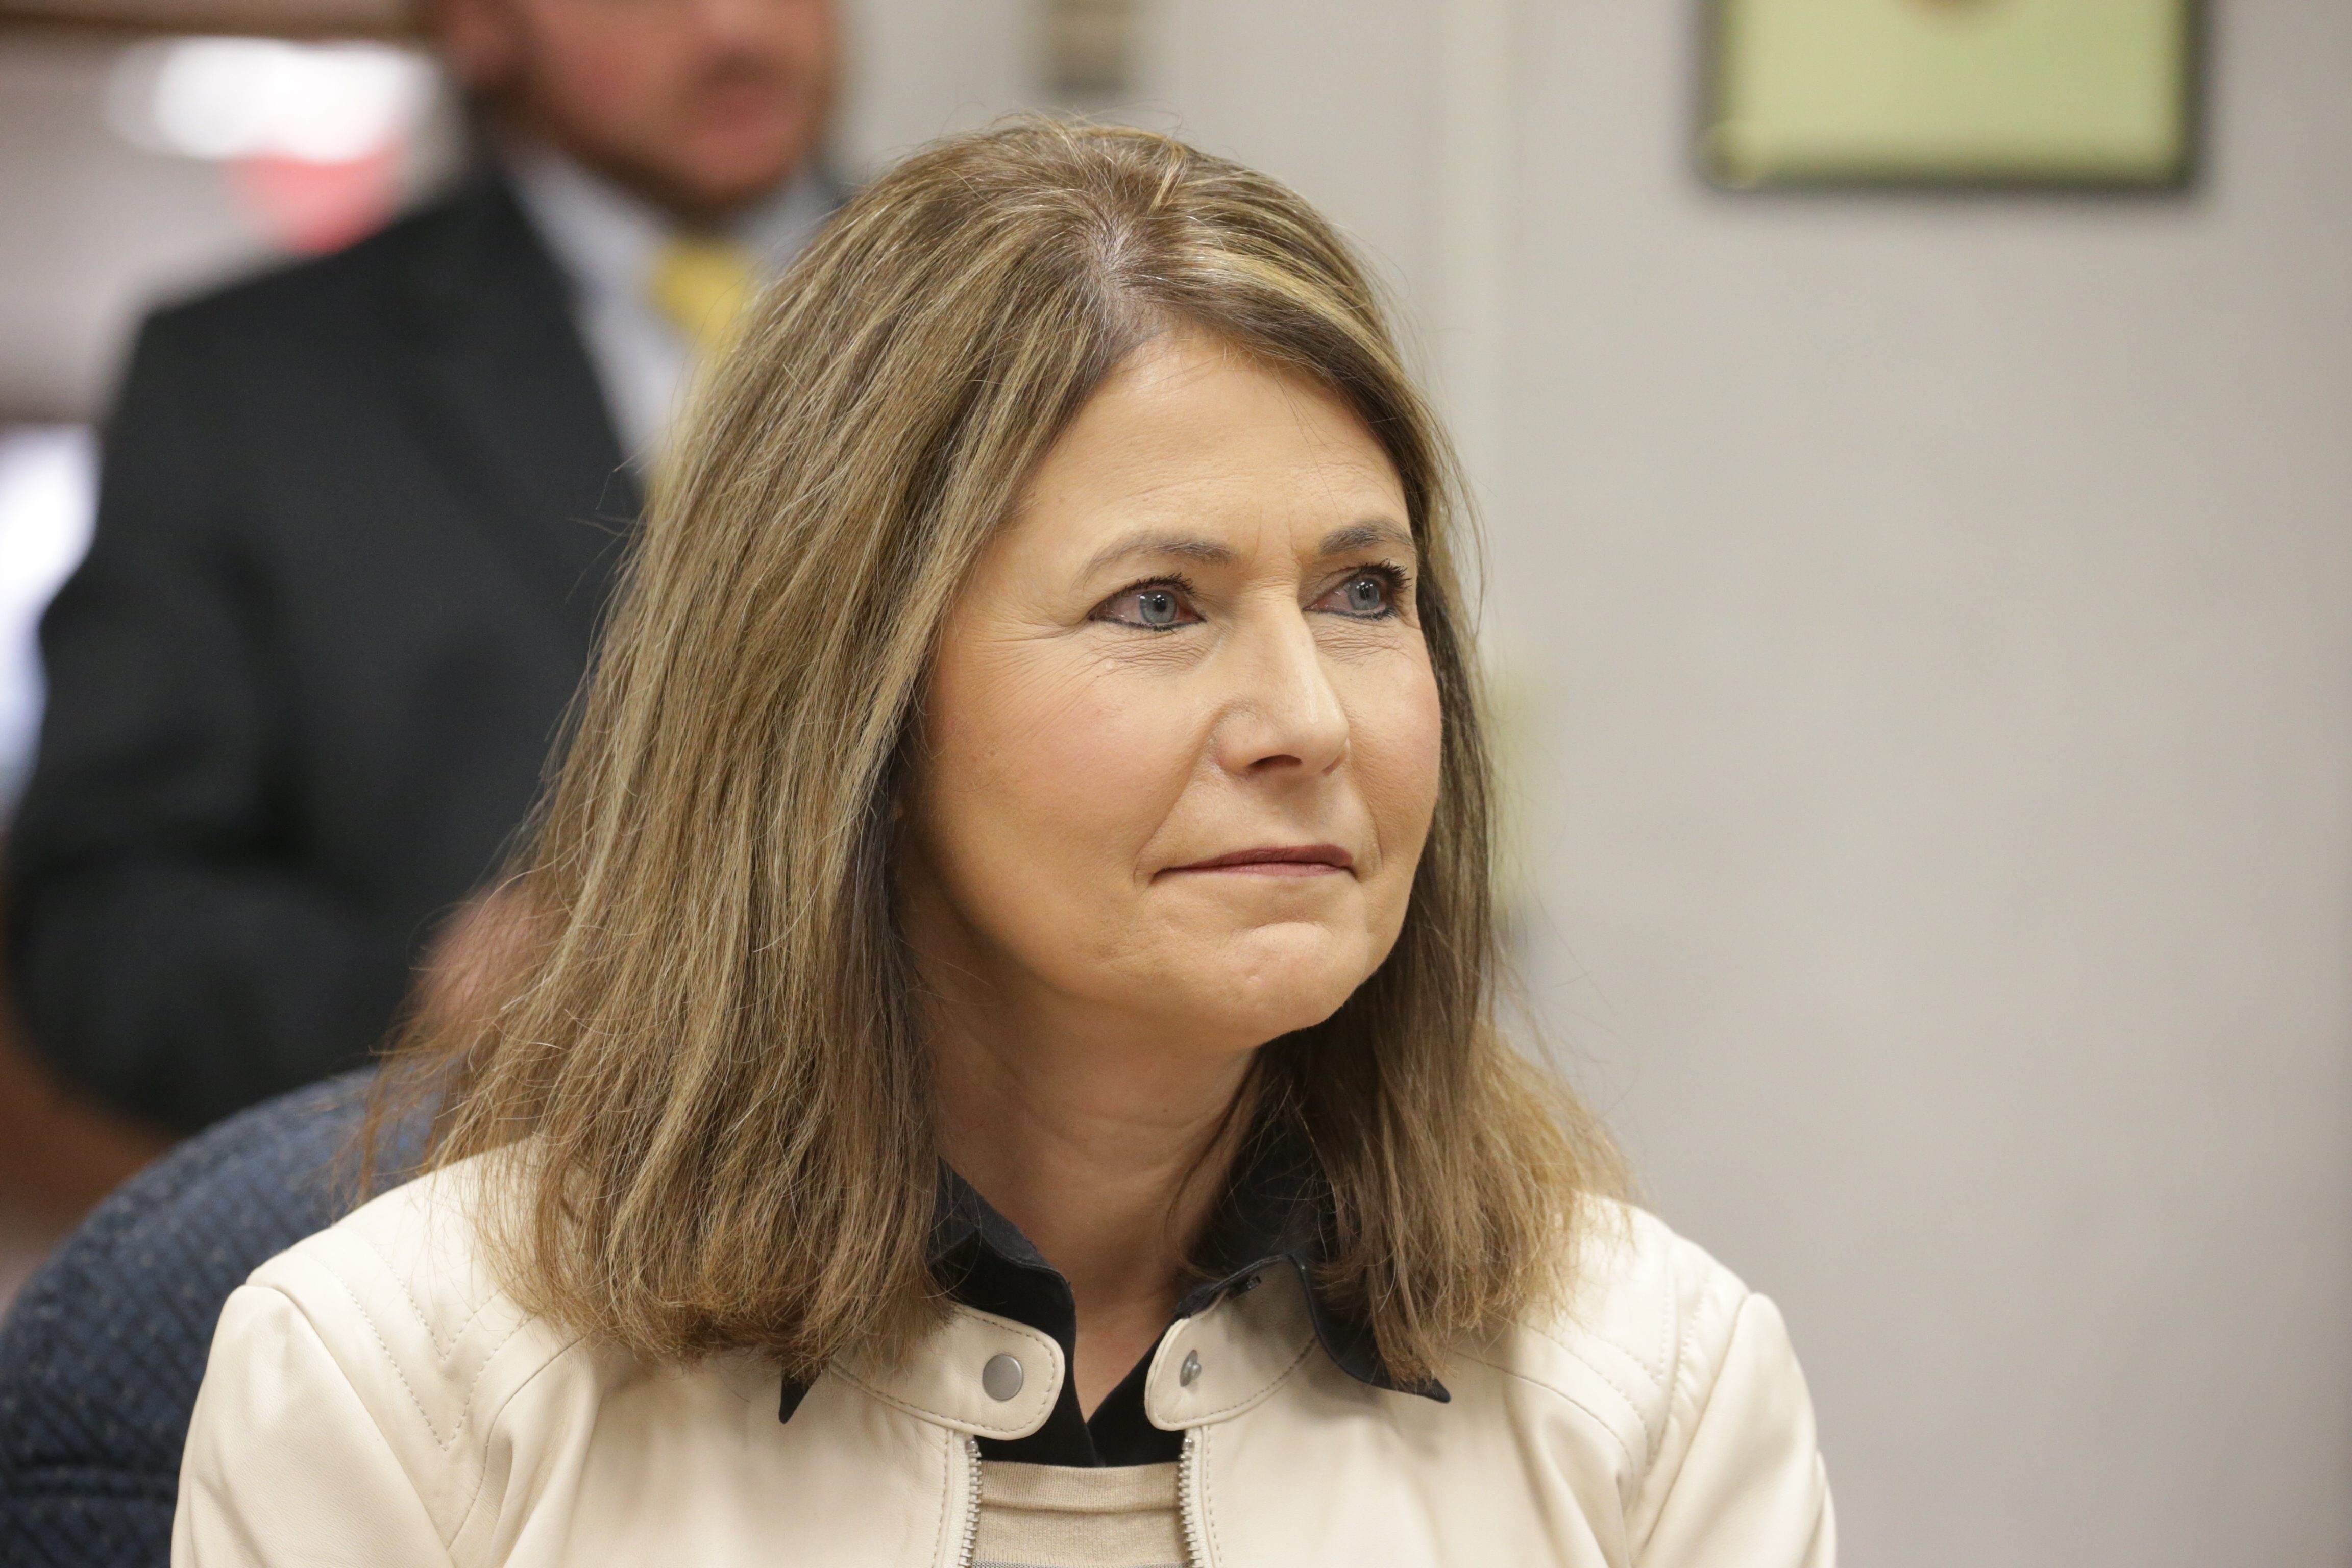 Ken-Ton Superintendent Dawn F. Mirand has announced she is retiring Jan. 10, 2017.